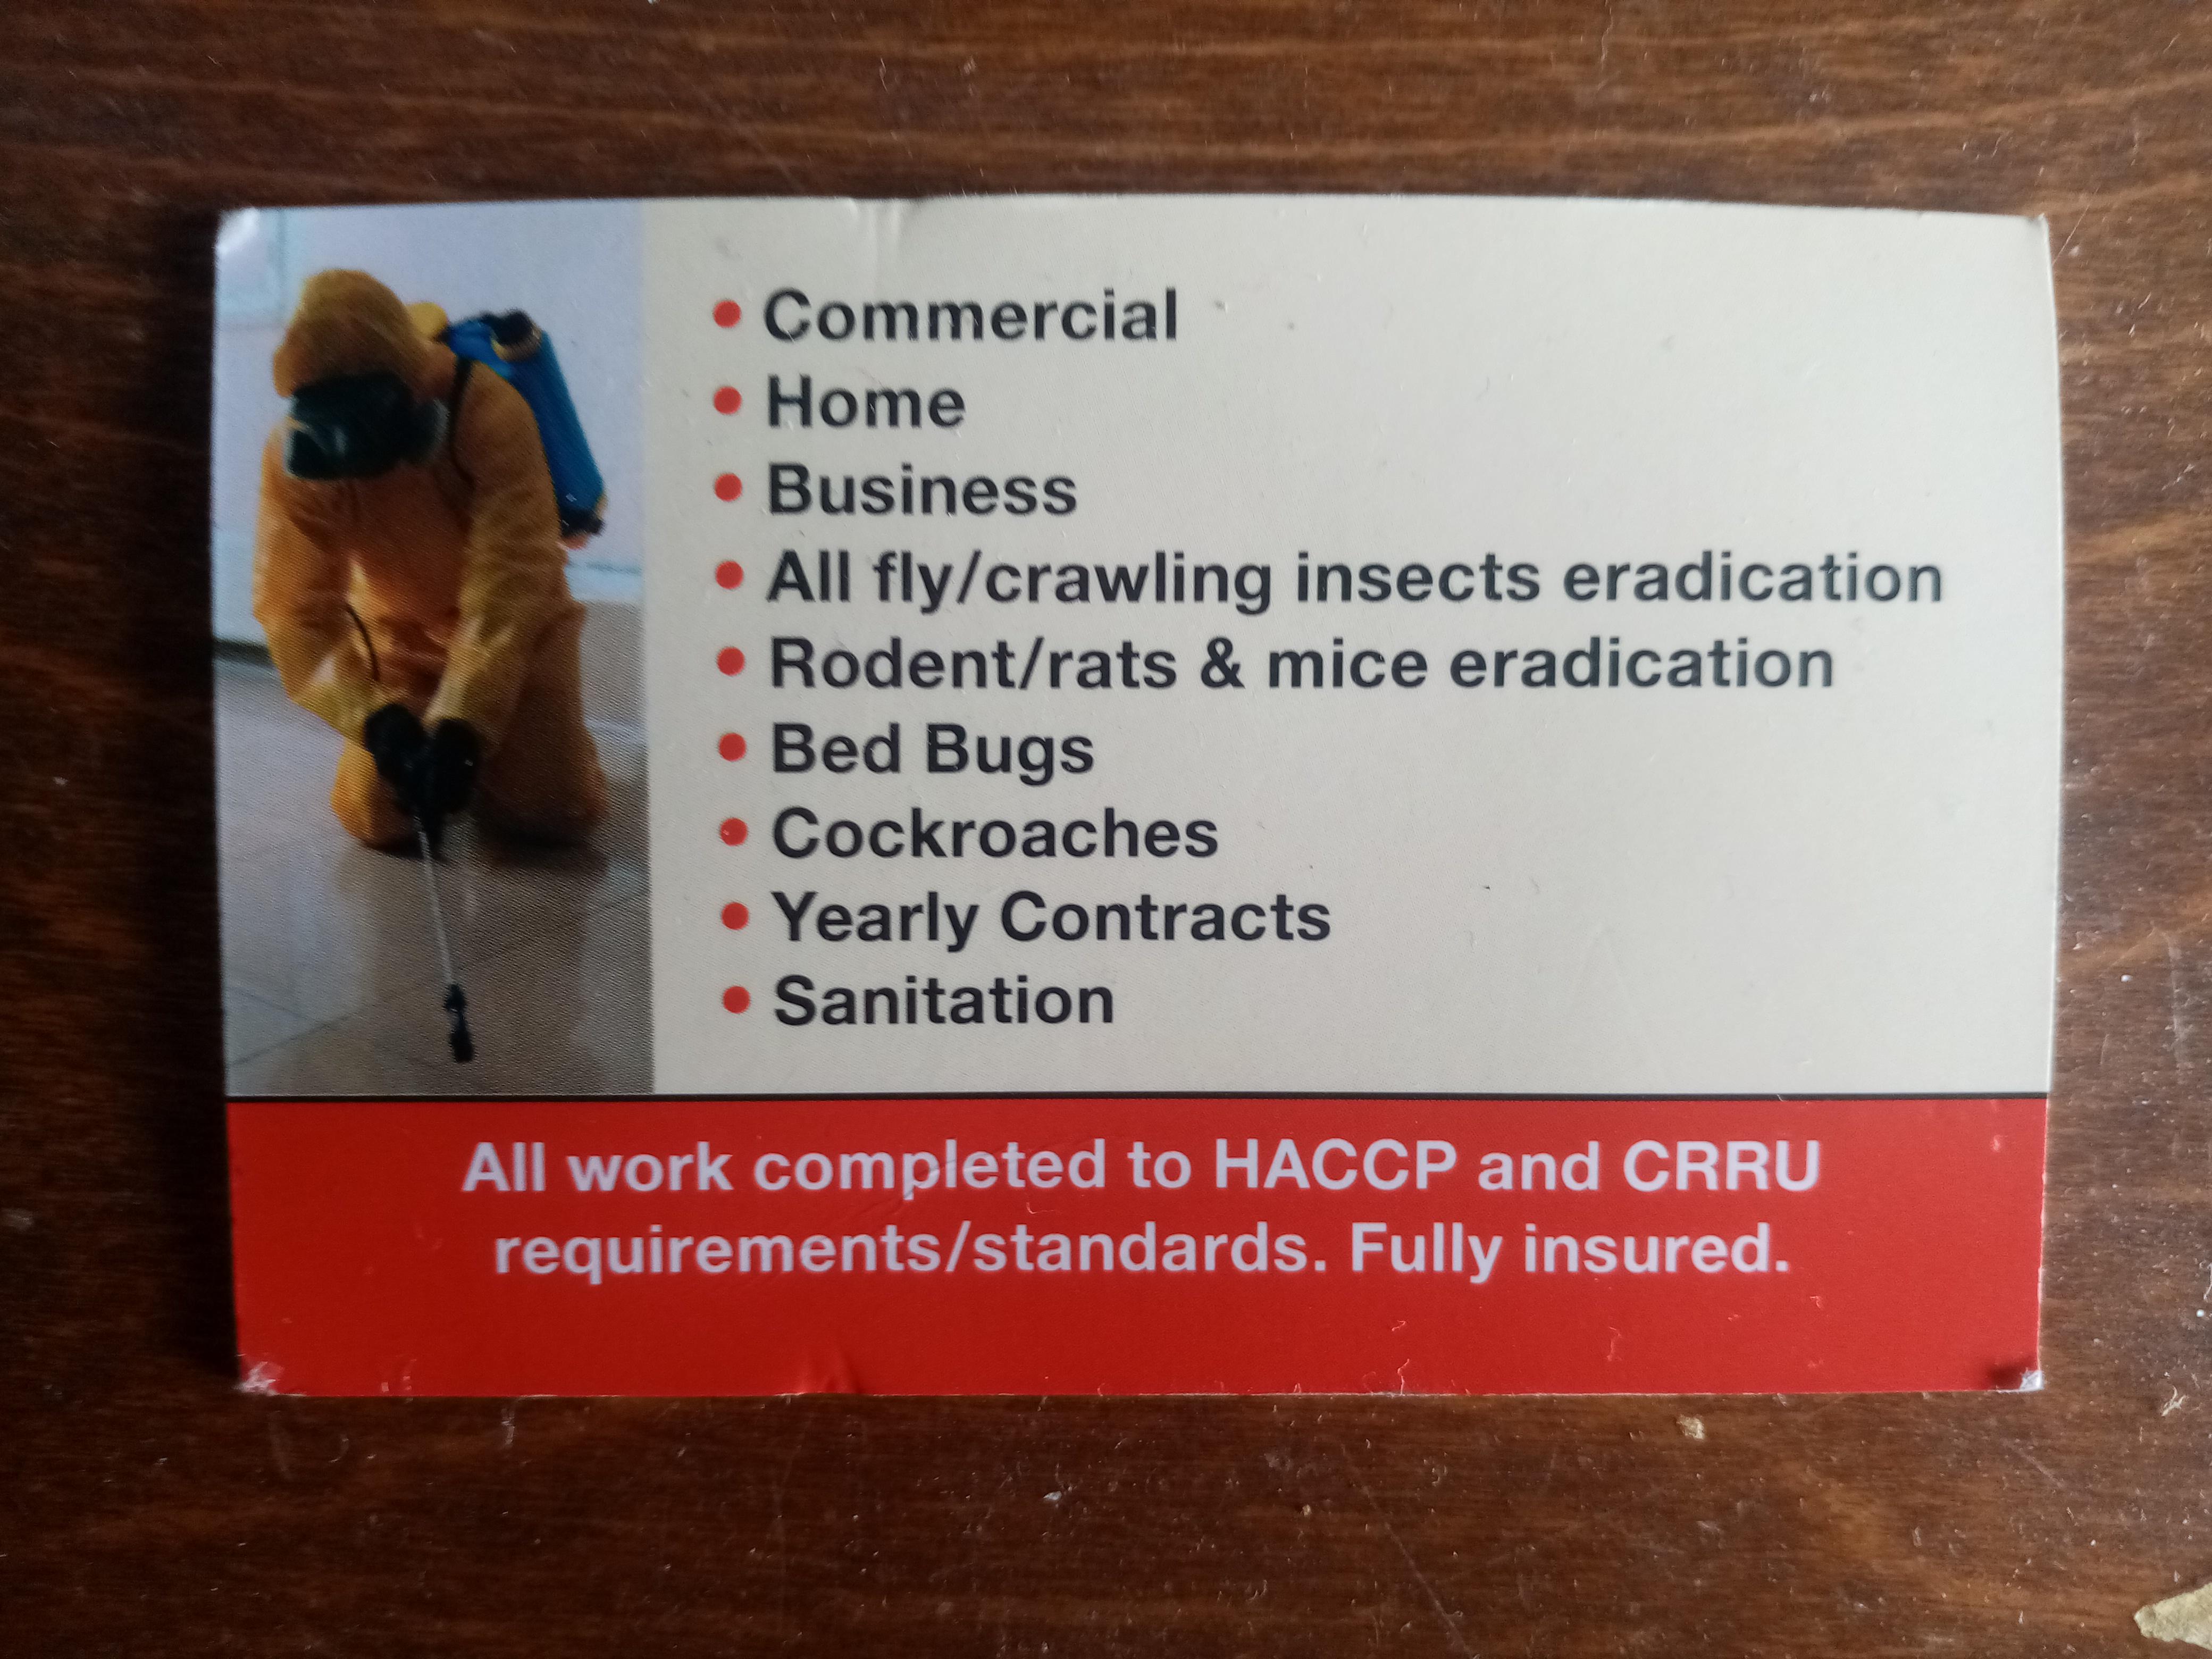 FEPC, fast effective pest control image 2